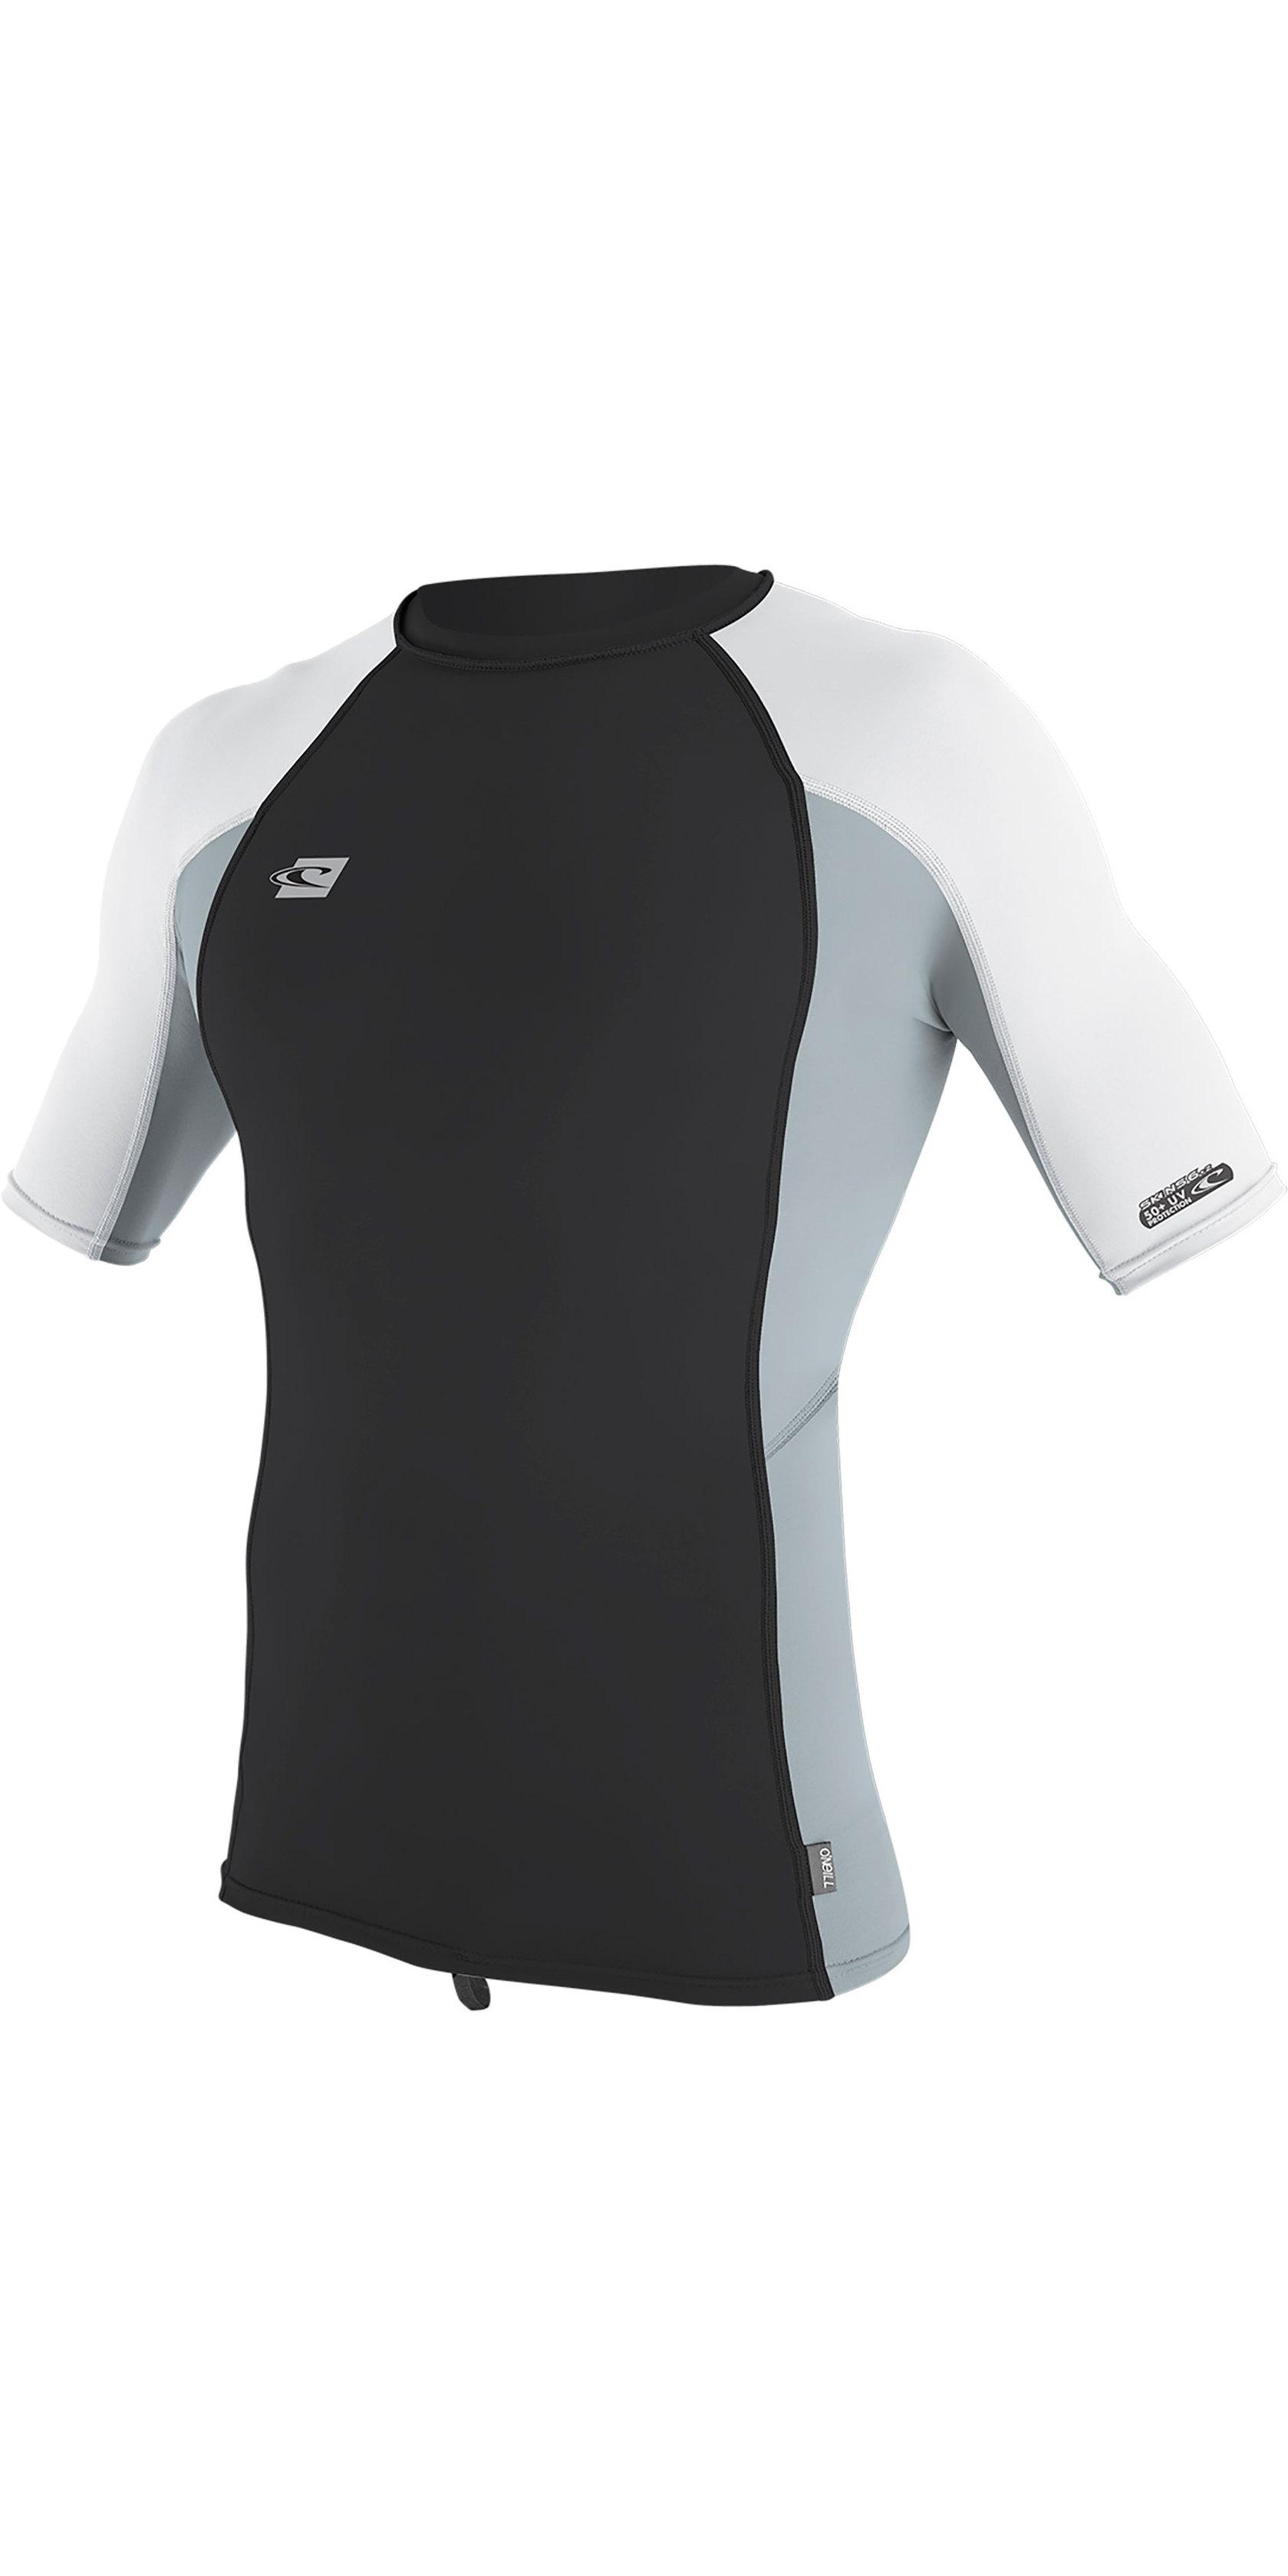 2019 O'Neill Mens Premium Skins Short Sleeve Rash Vest Oil / Grey / White 4169B